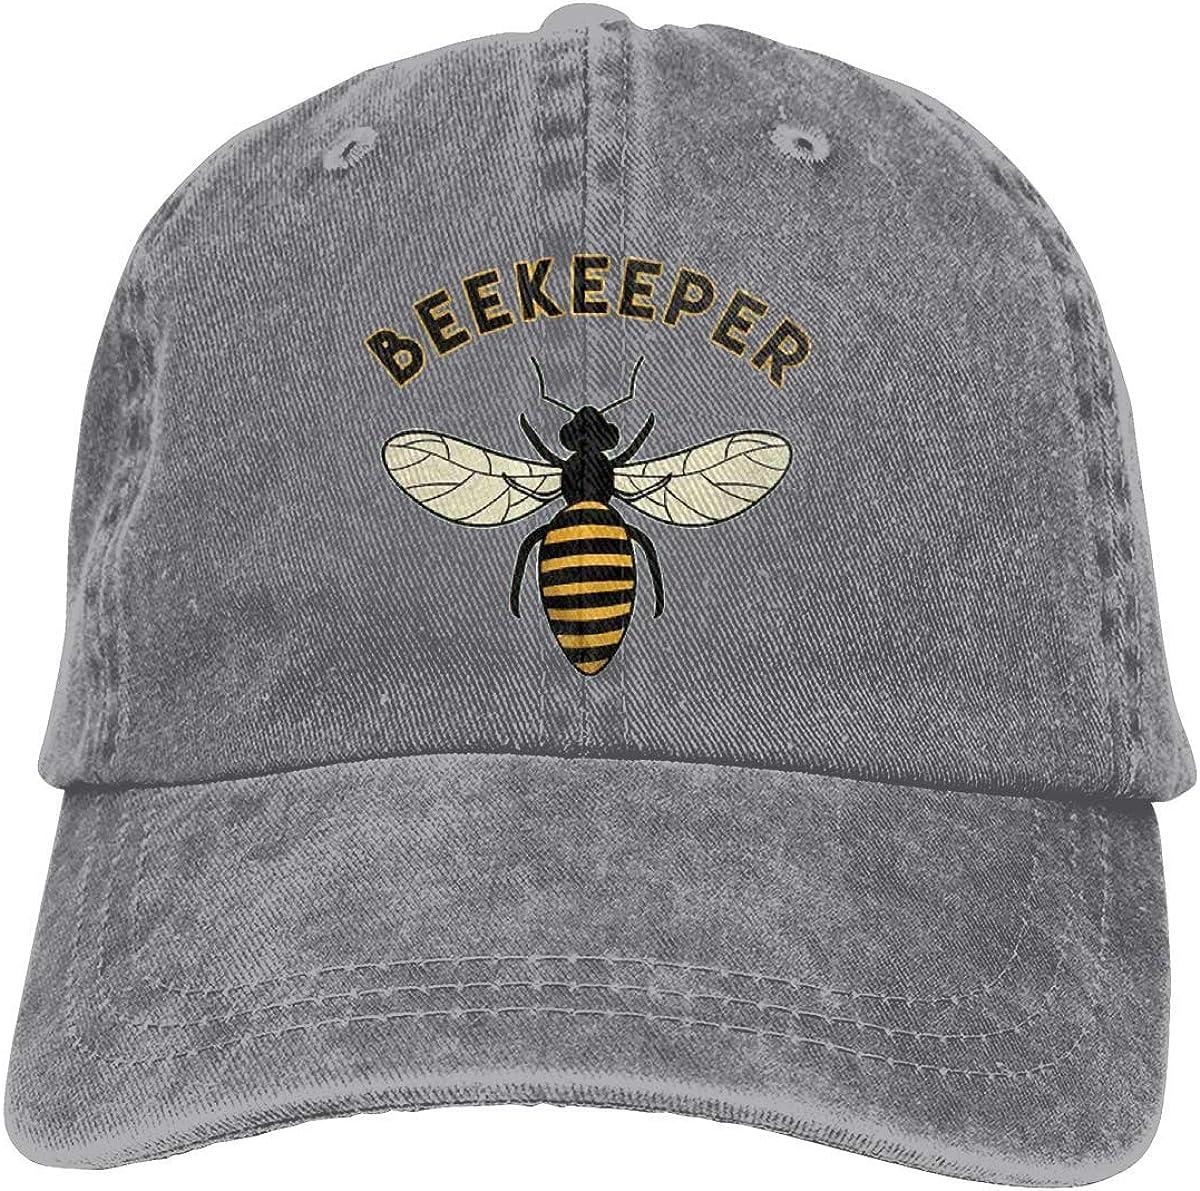 Beekeeper Baseball Cap, Adjustable Size Dad Hat, Vintage Baseball Hats for Men Woman